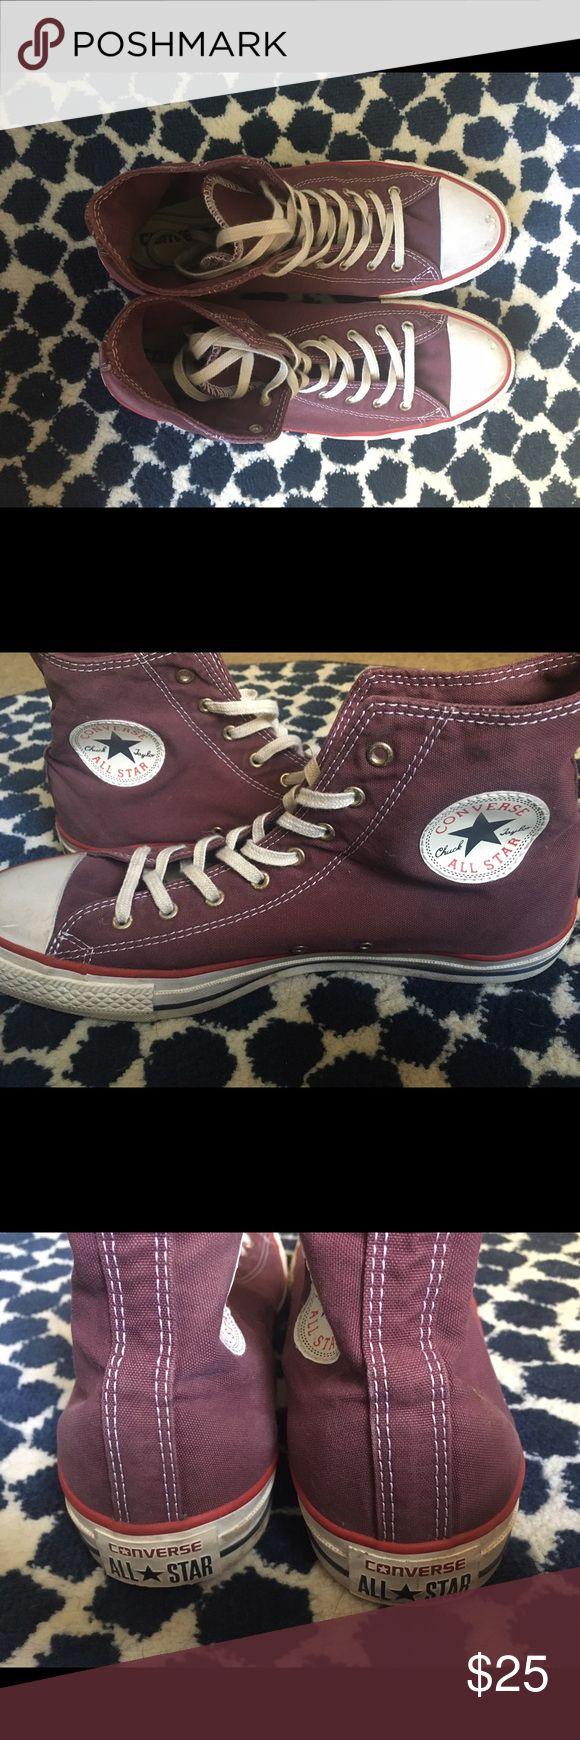 Maroon Converse Hightops High top converse. Worn twice, maroon color. Men's 8.5, women's 10.5 Converse Shoes Sneakers